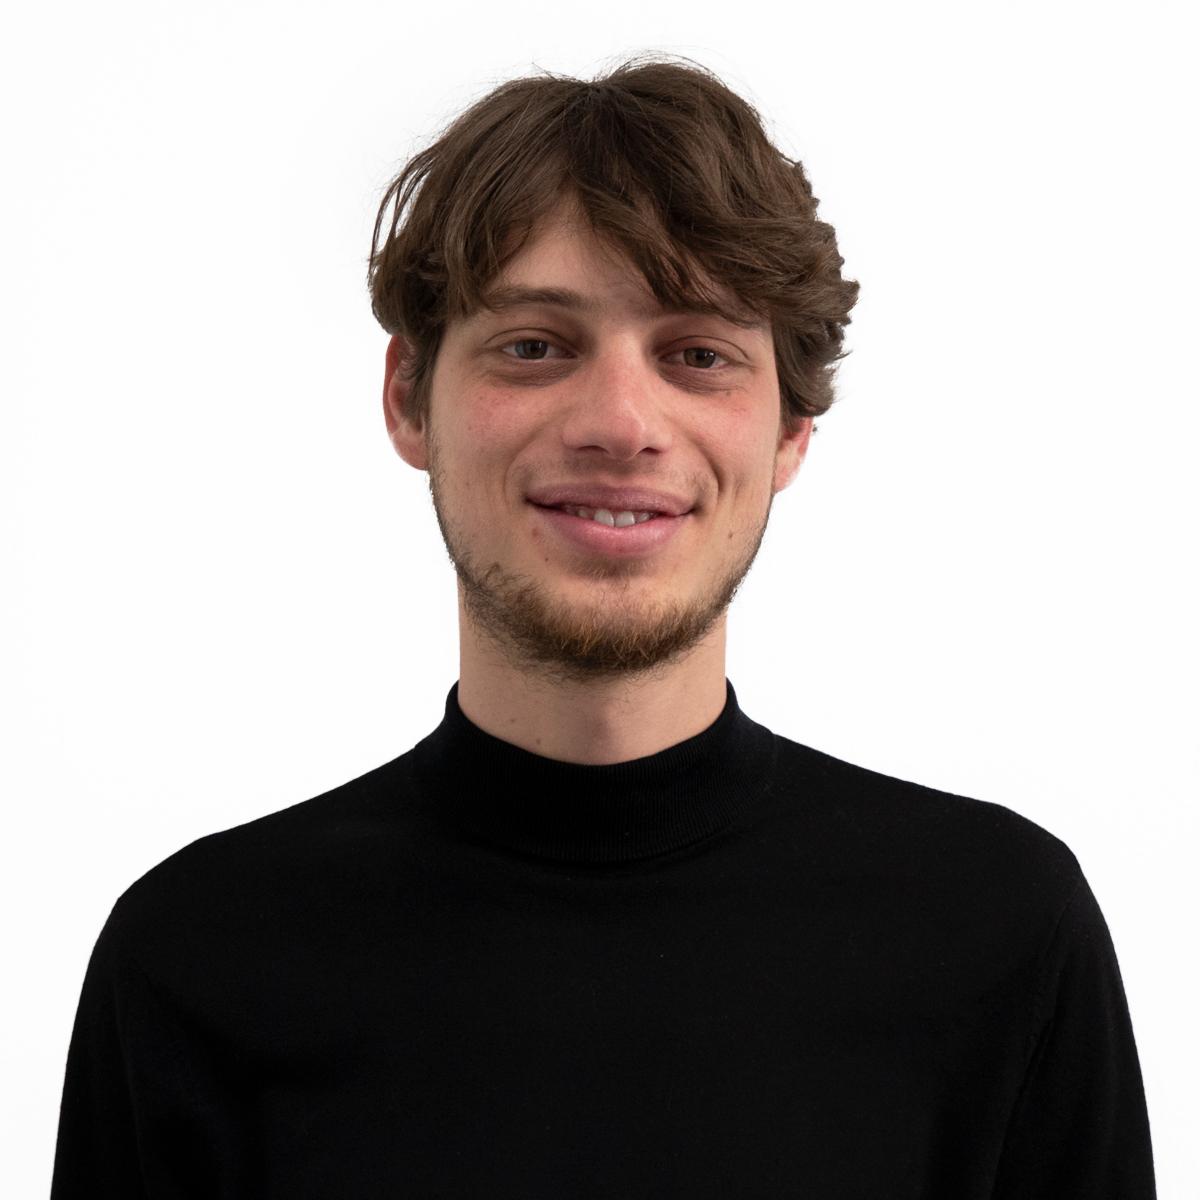 Francesco Muccioli